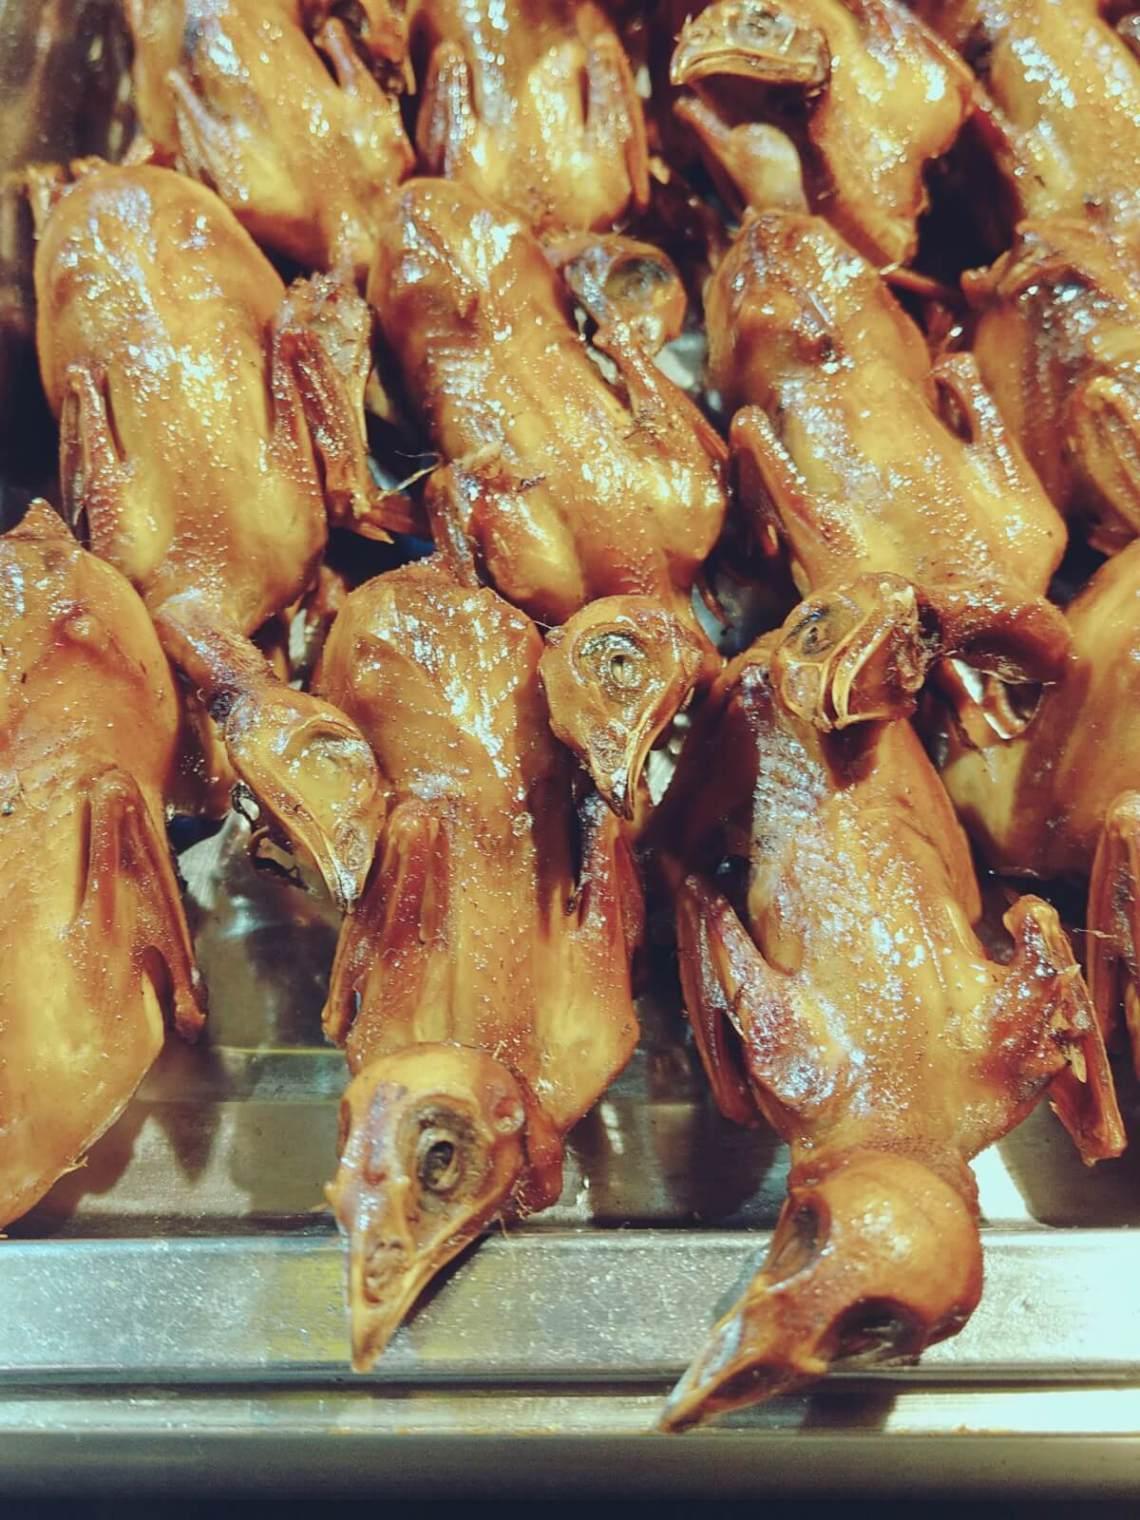 Smażone kurczaki na chińskim targu.